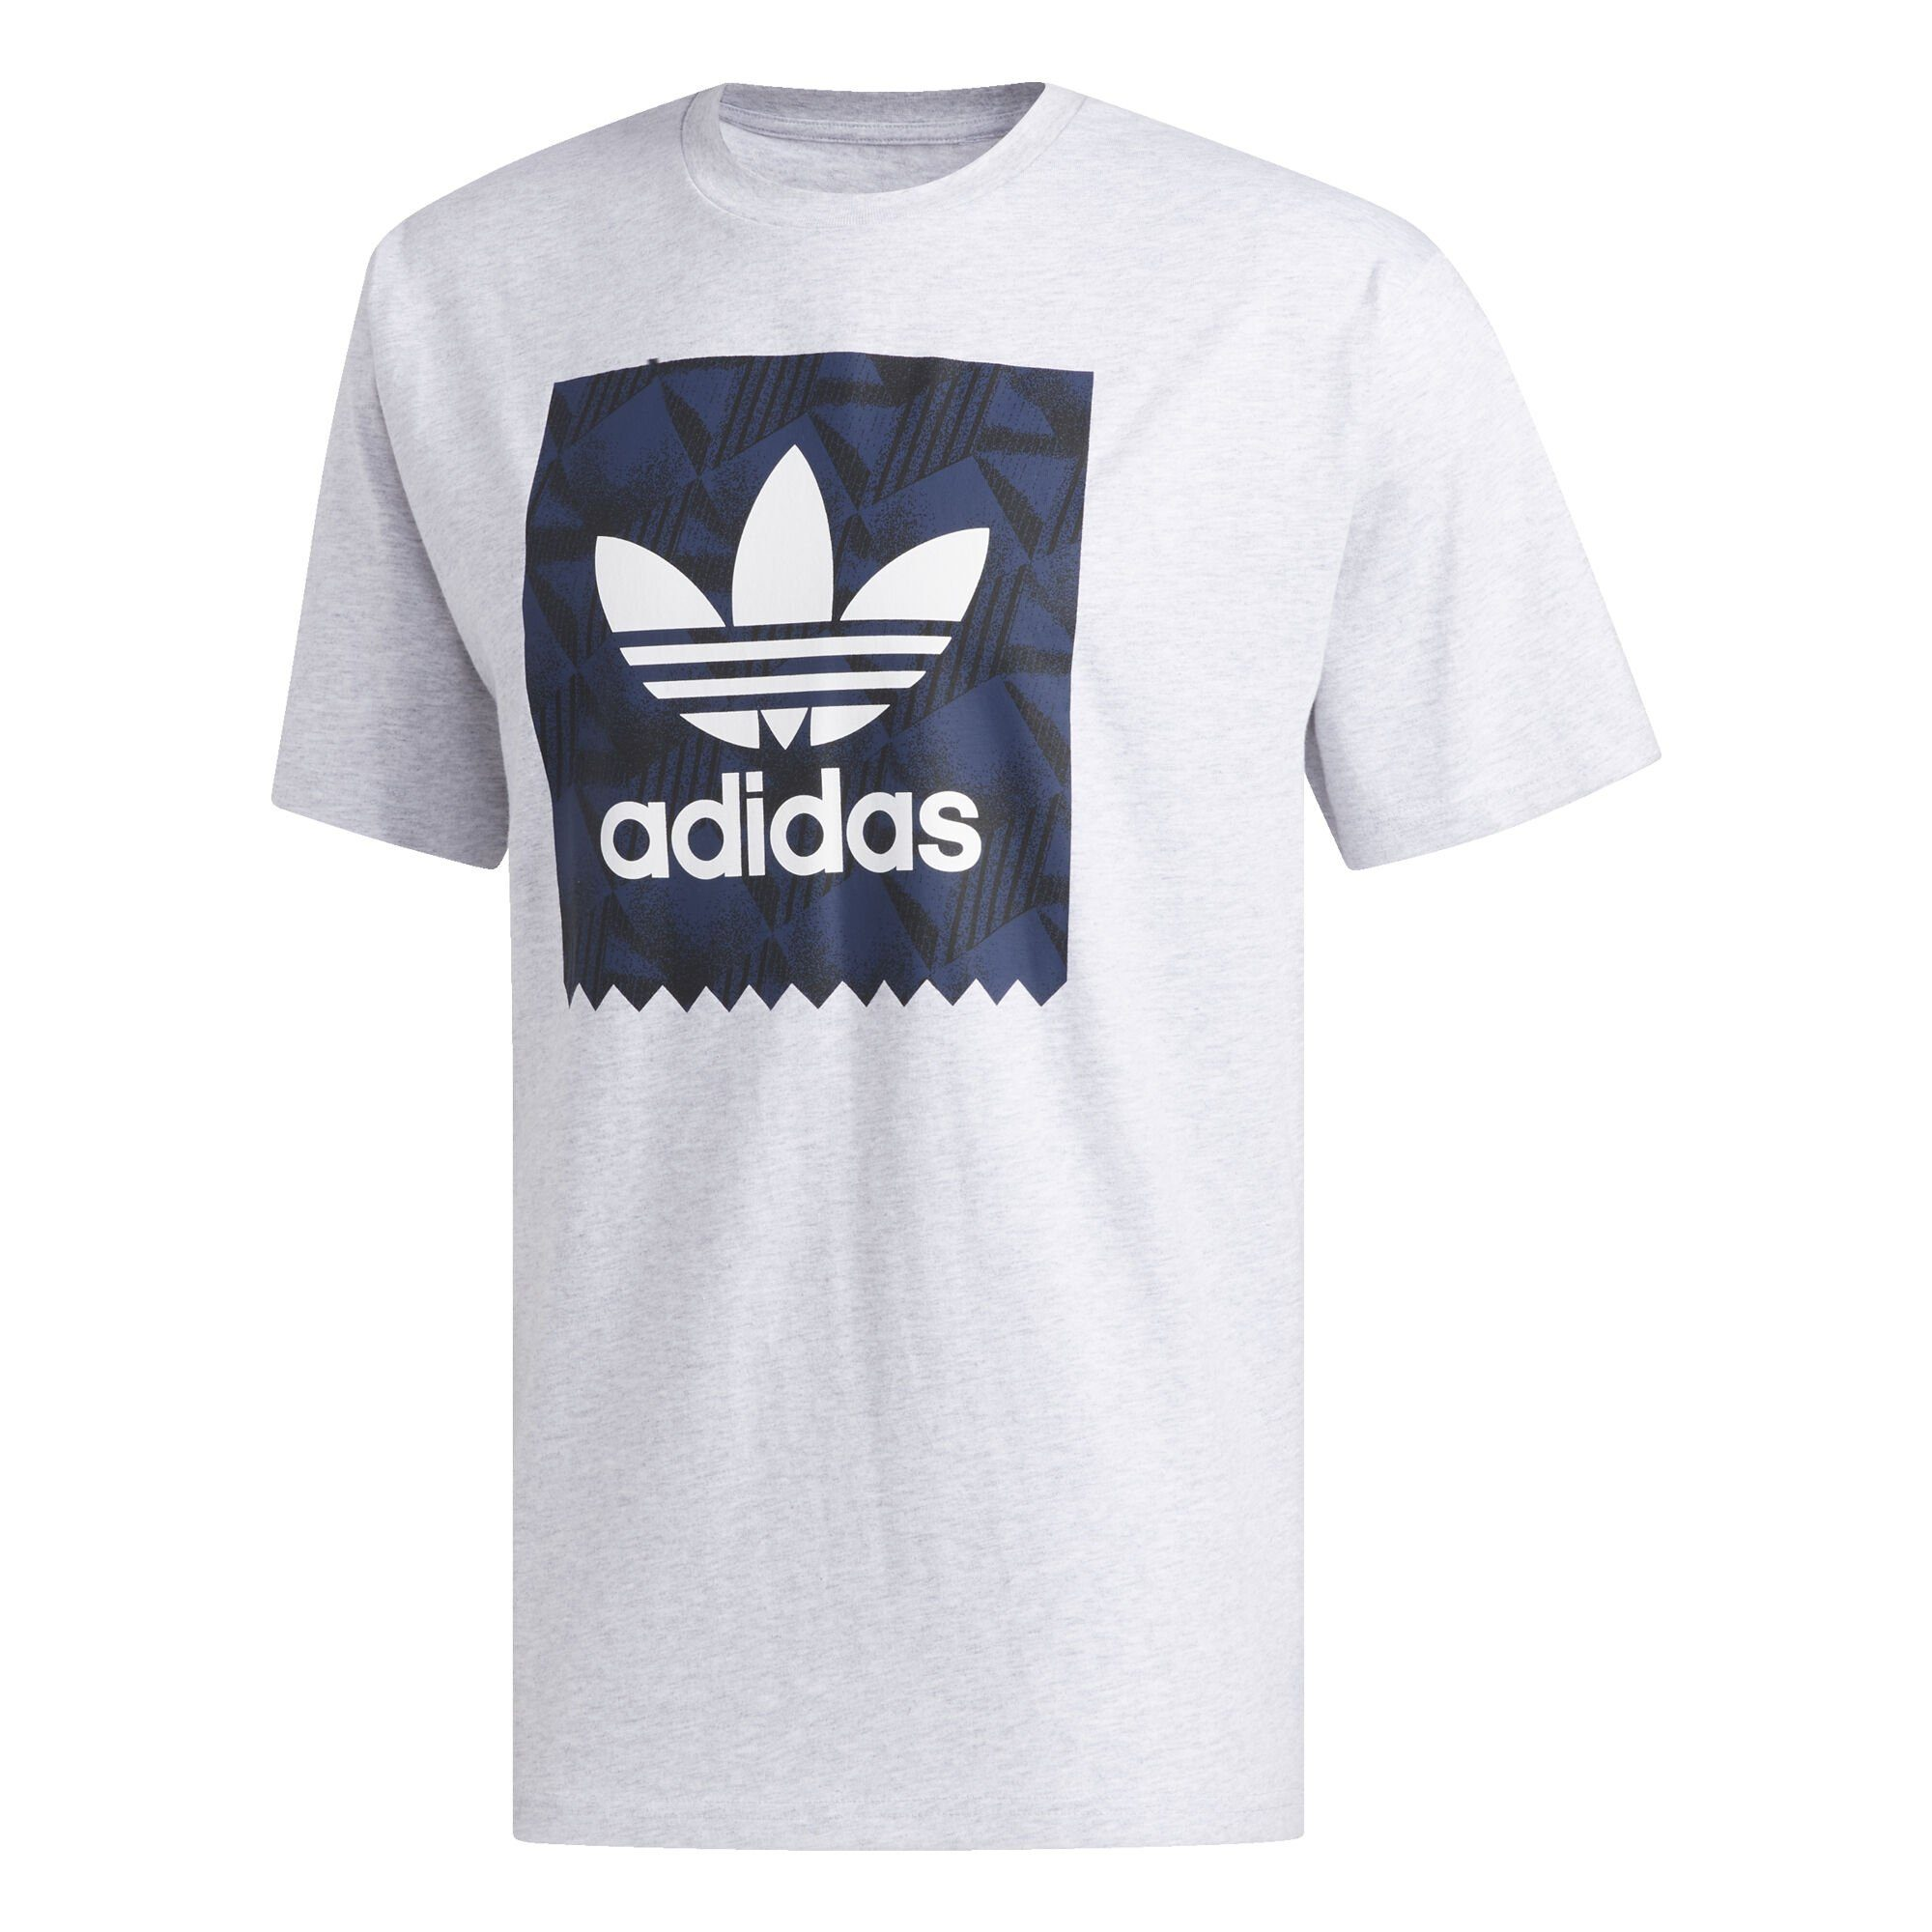 adidas Originals T Shirt »BB Print T Shirt« kaufen   OTTO